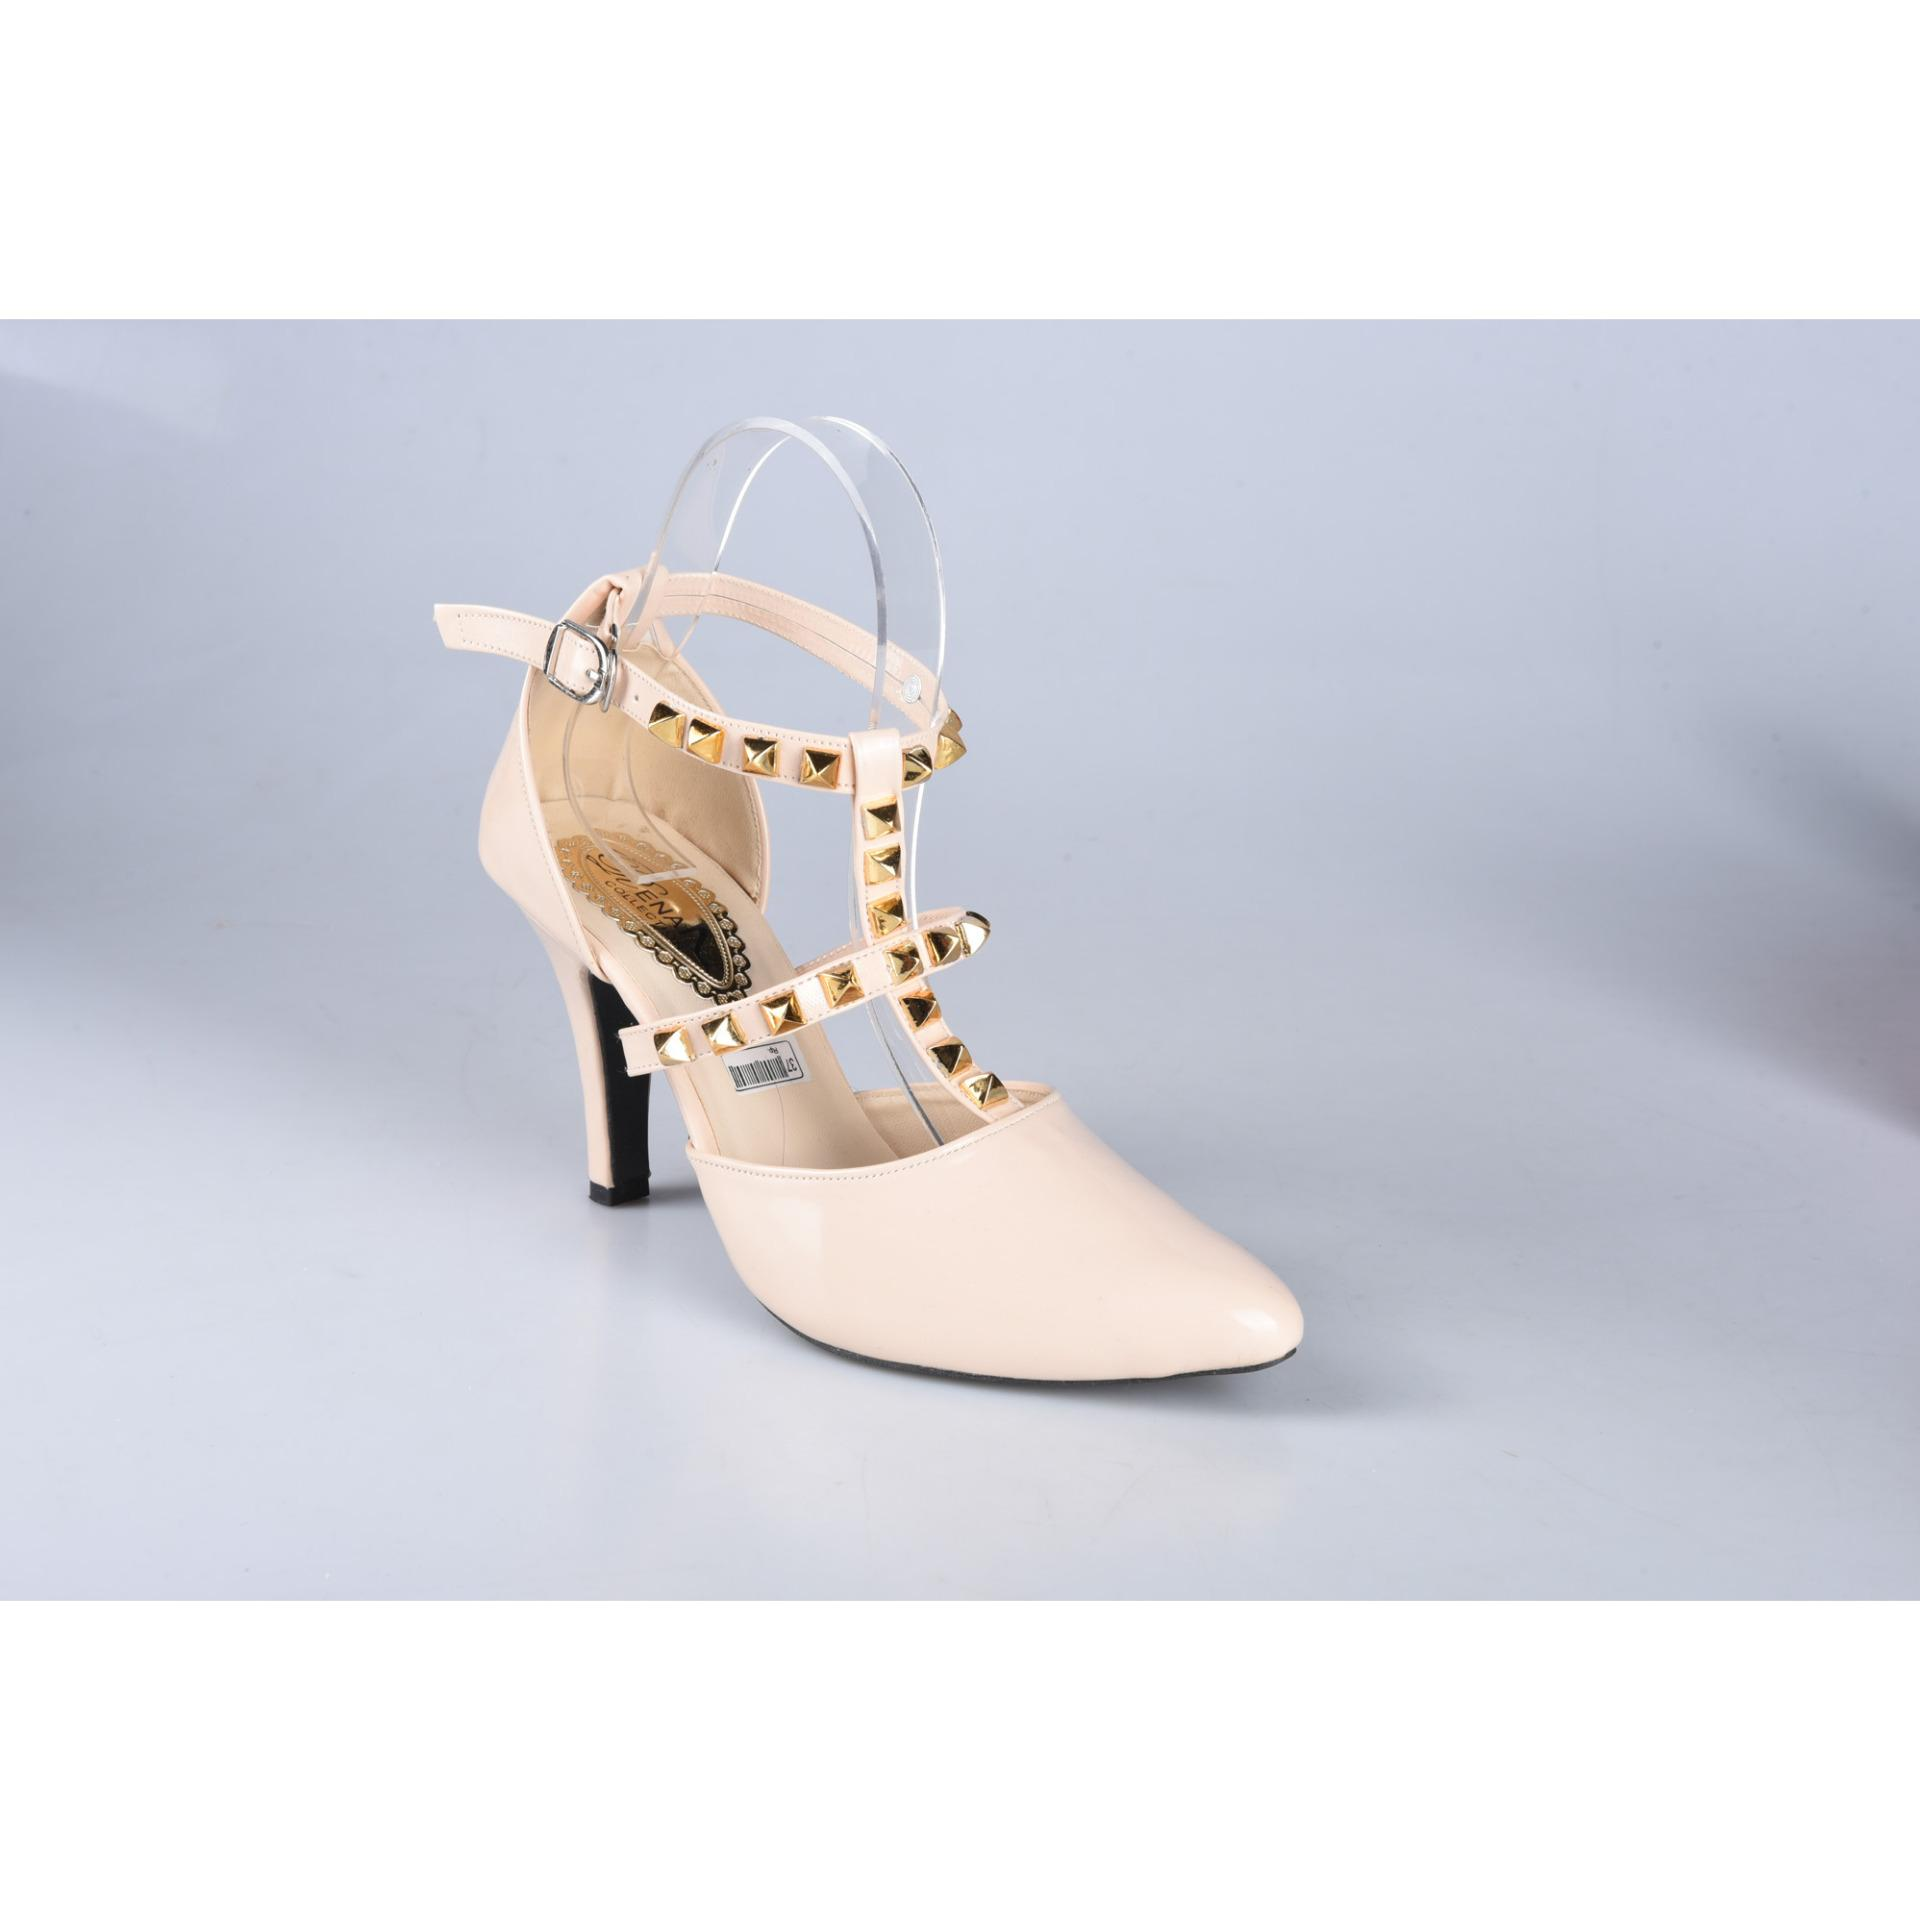 High Heels Sepatu Wanita Cream - S229